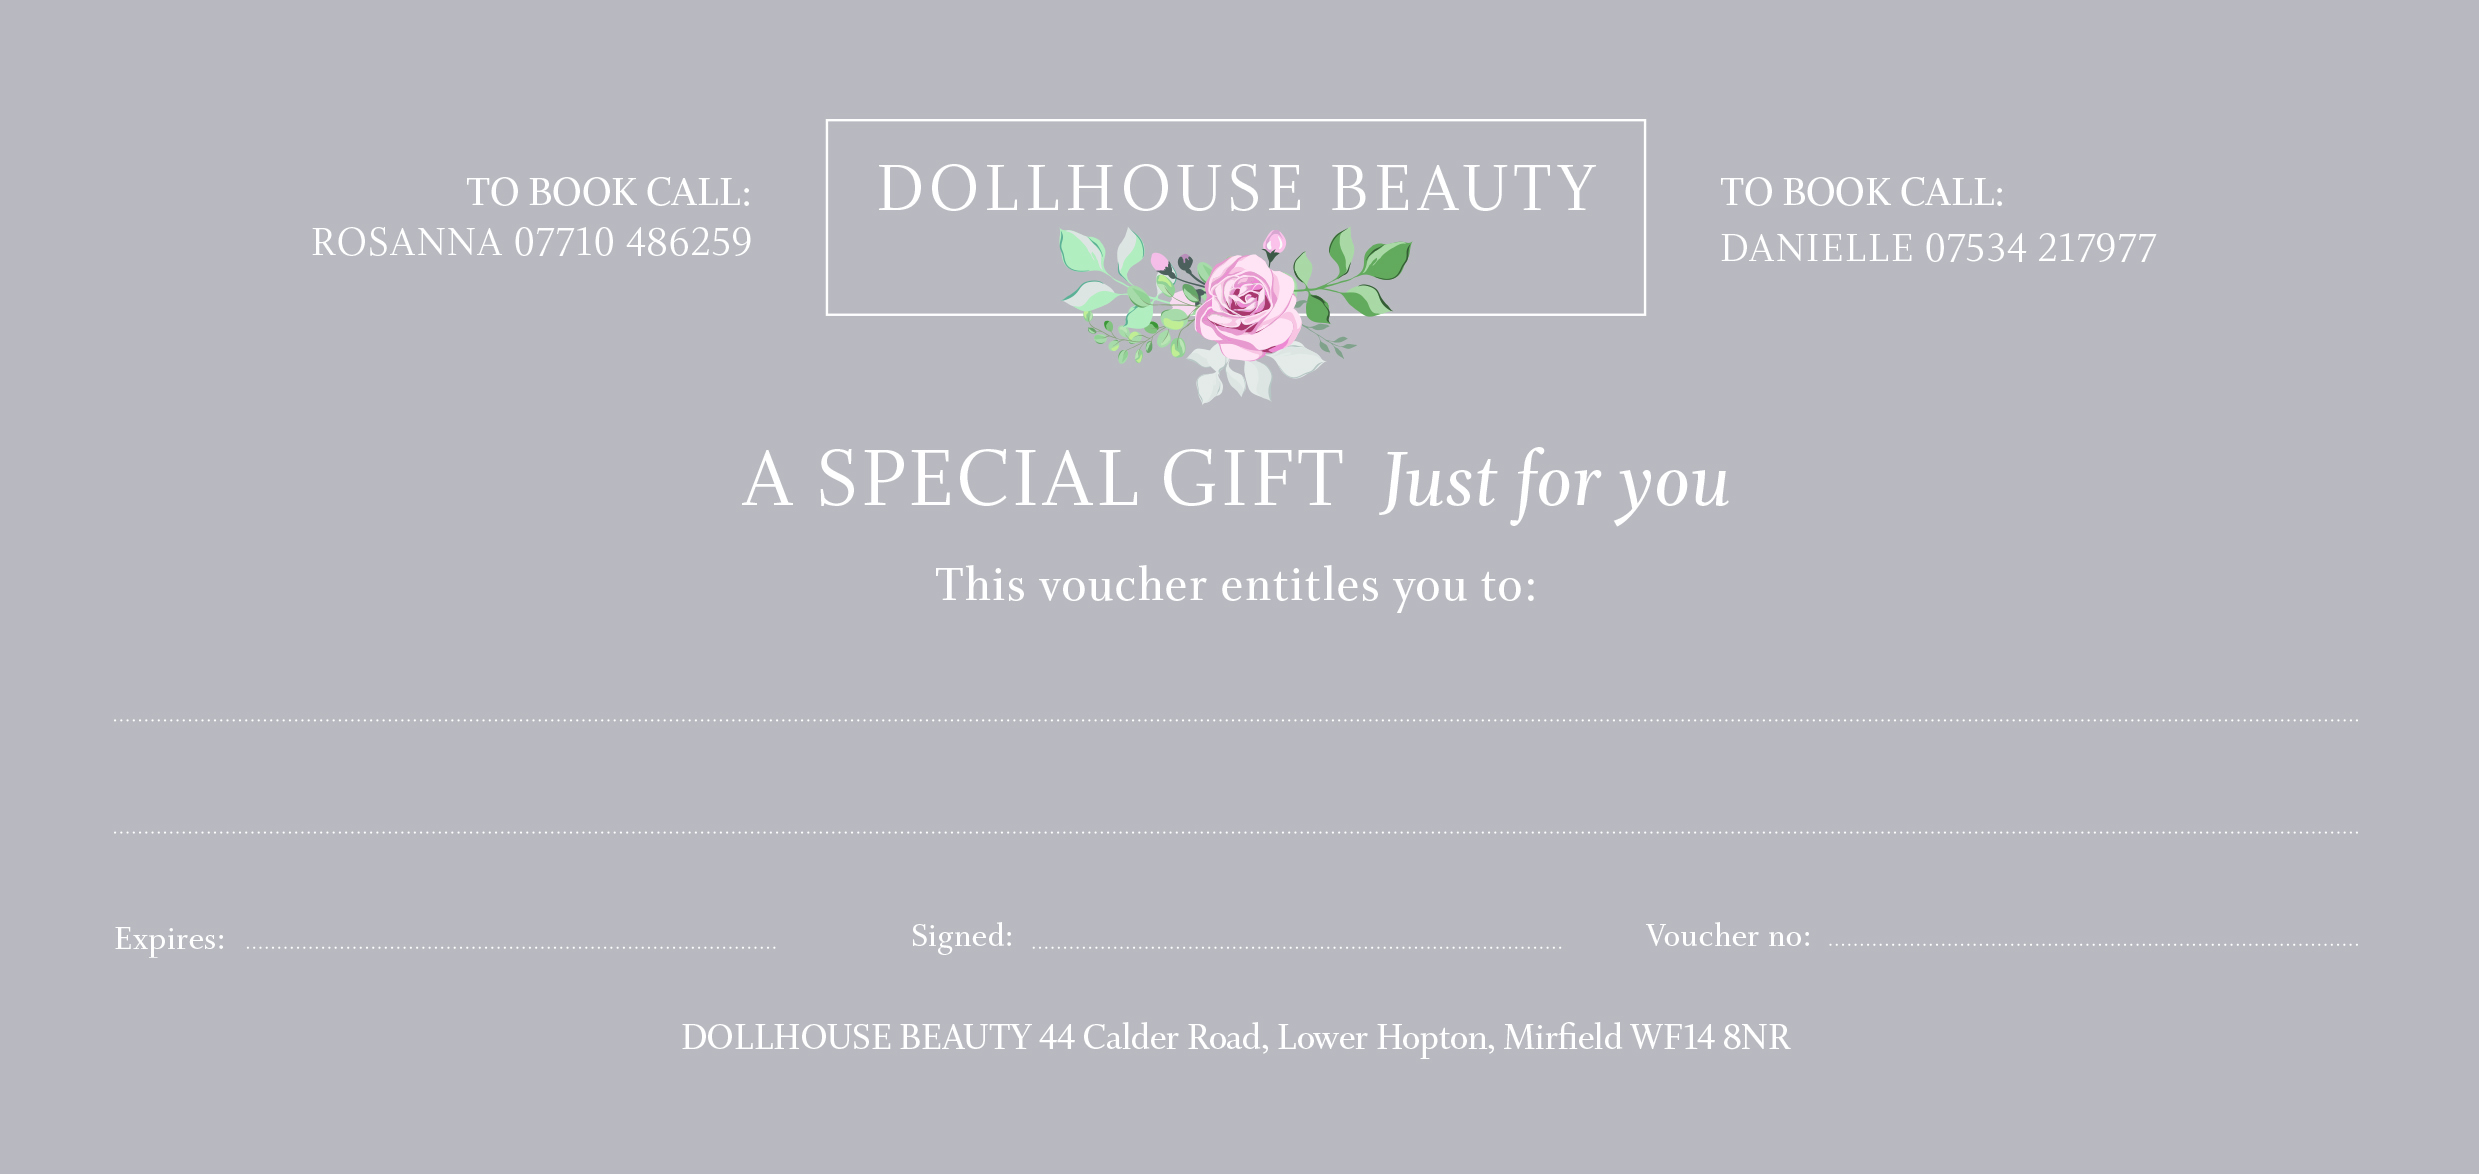 Dollhouse voucher